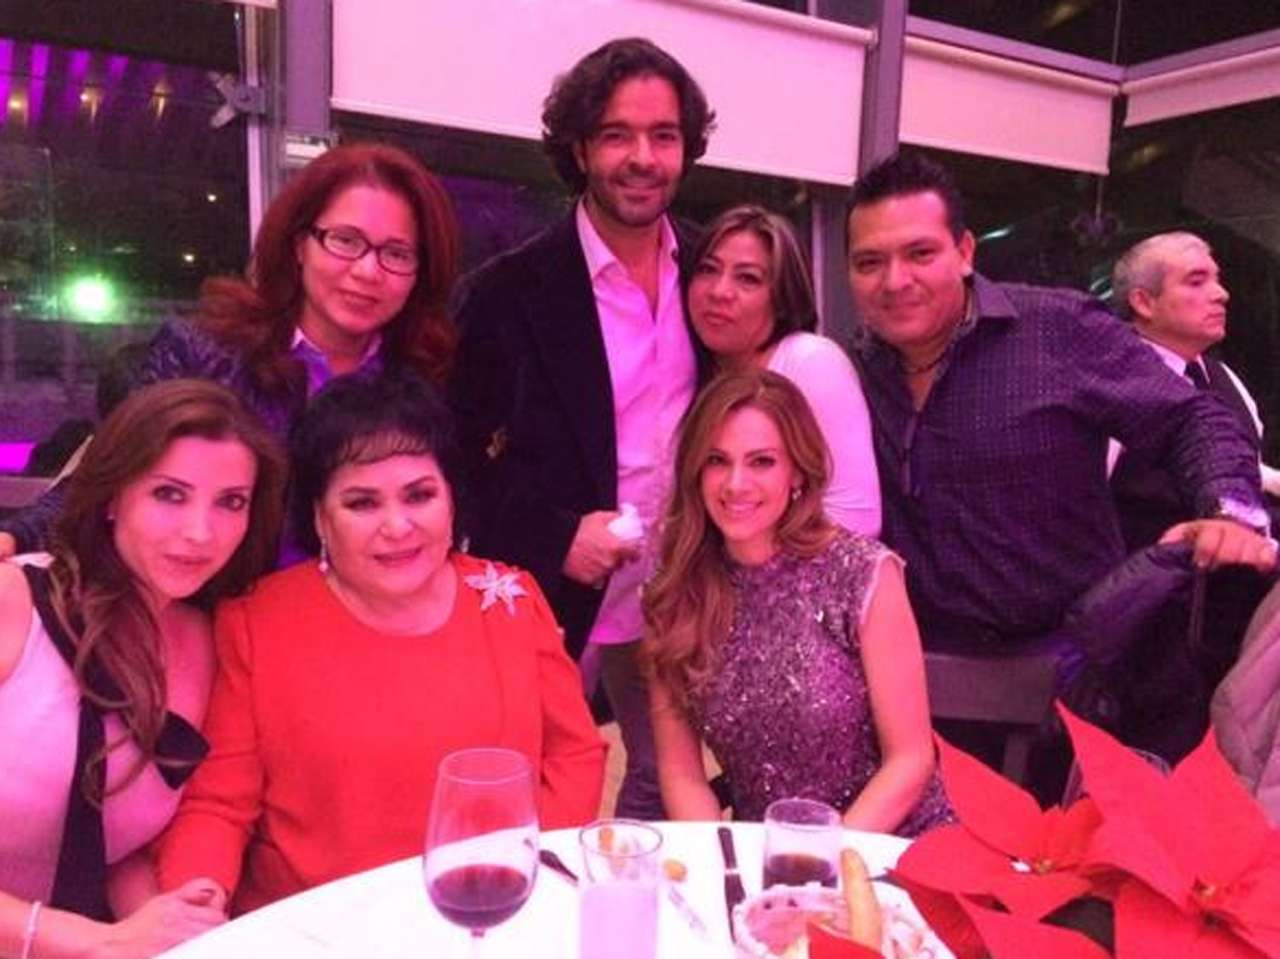 Pablo Montero y la esposa de Juan Osorio estuvieron en el festejo. Foto: Twitter/@LuzElenaGlez